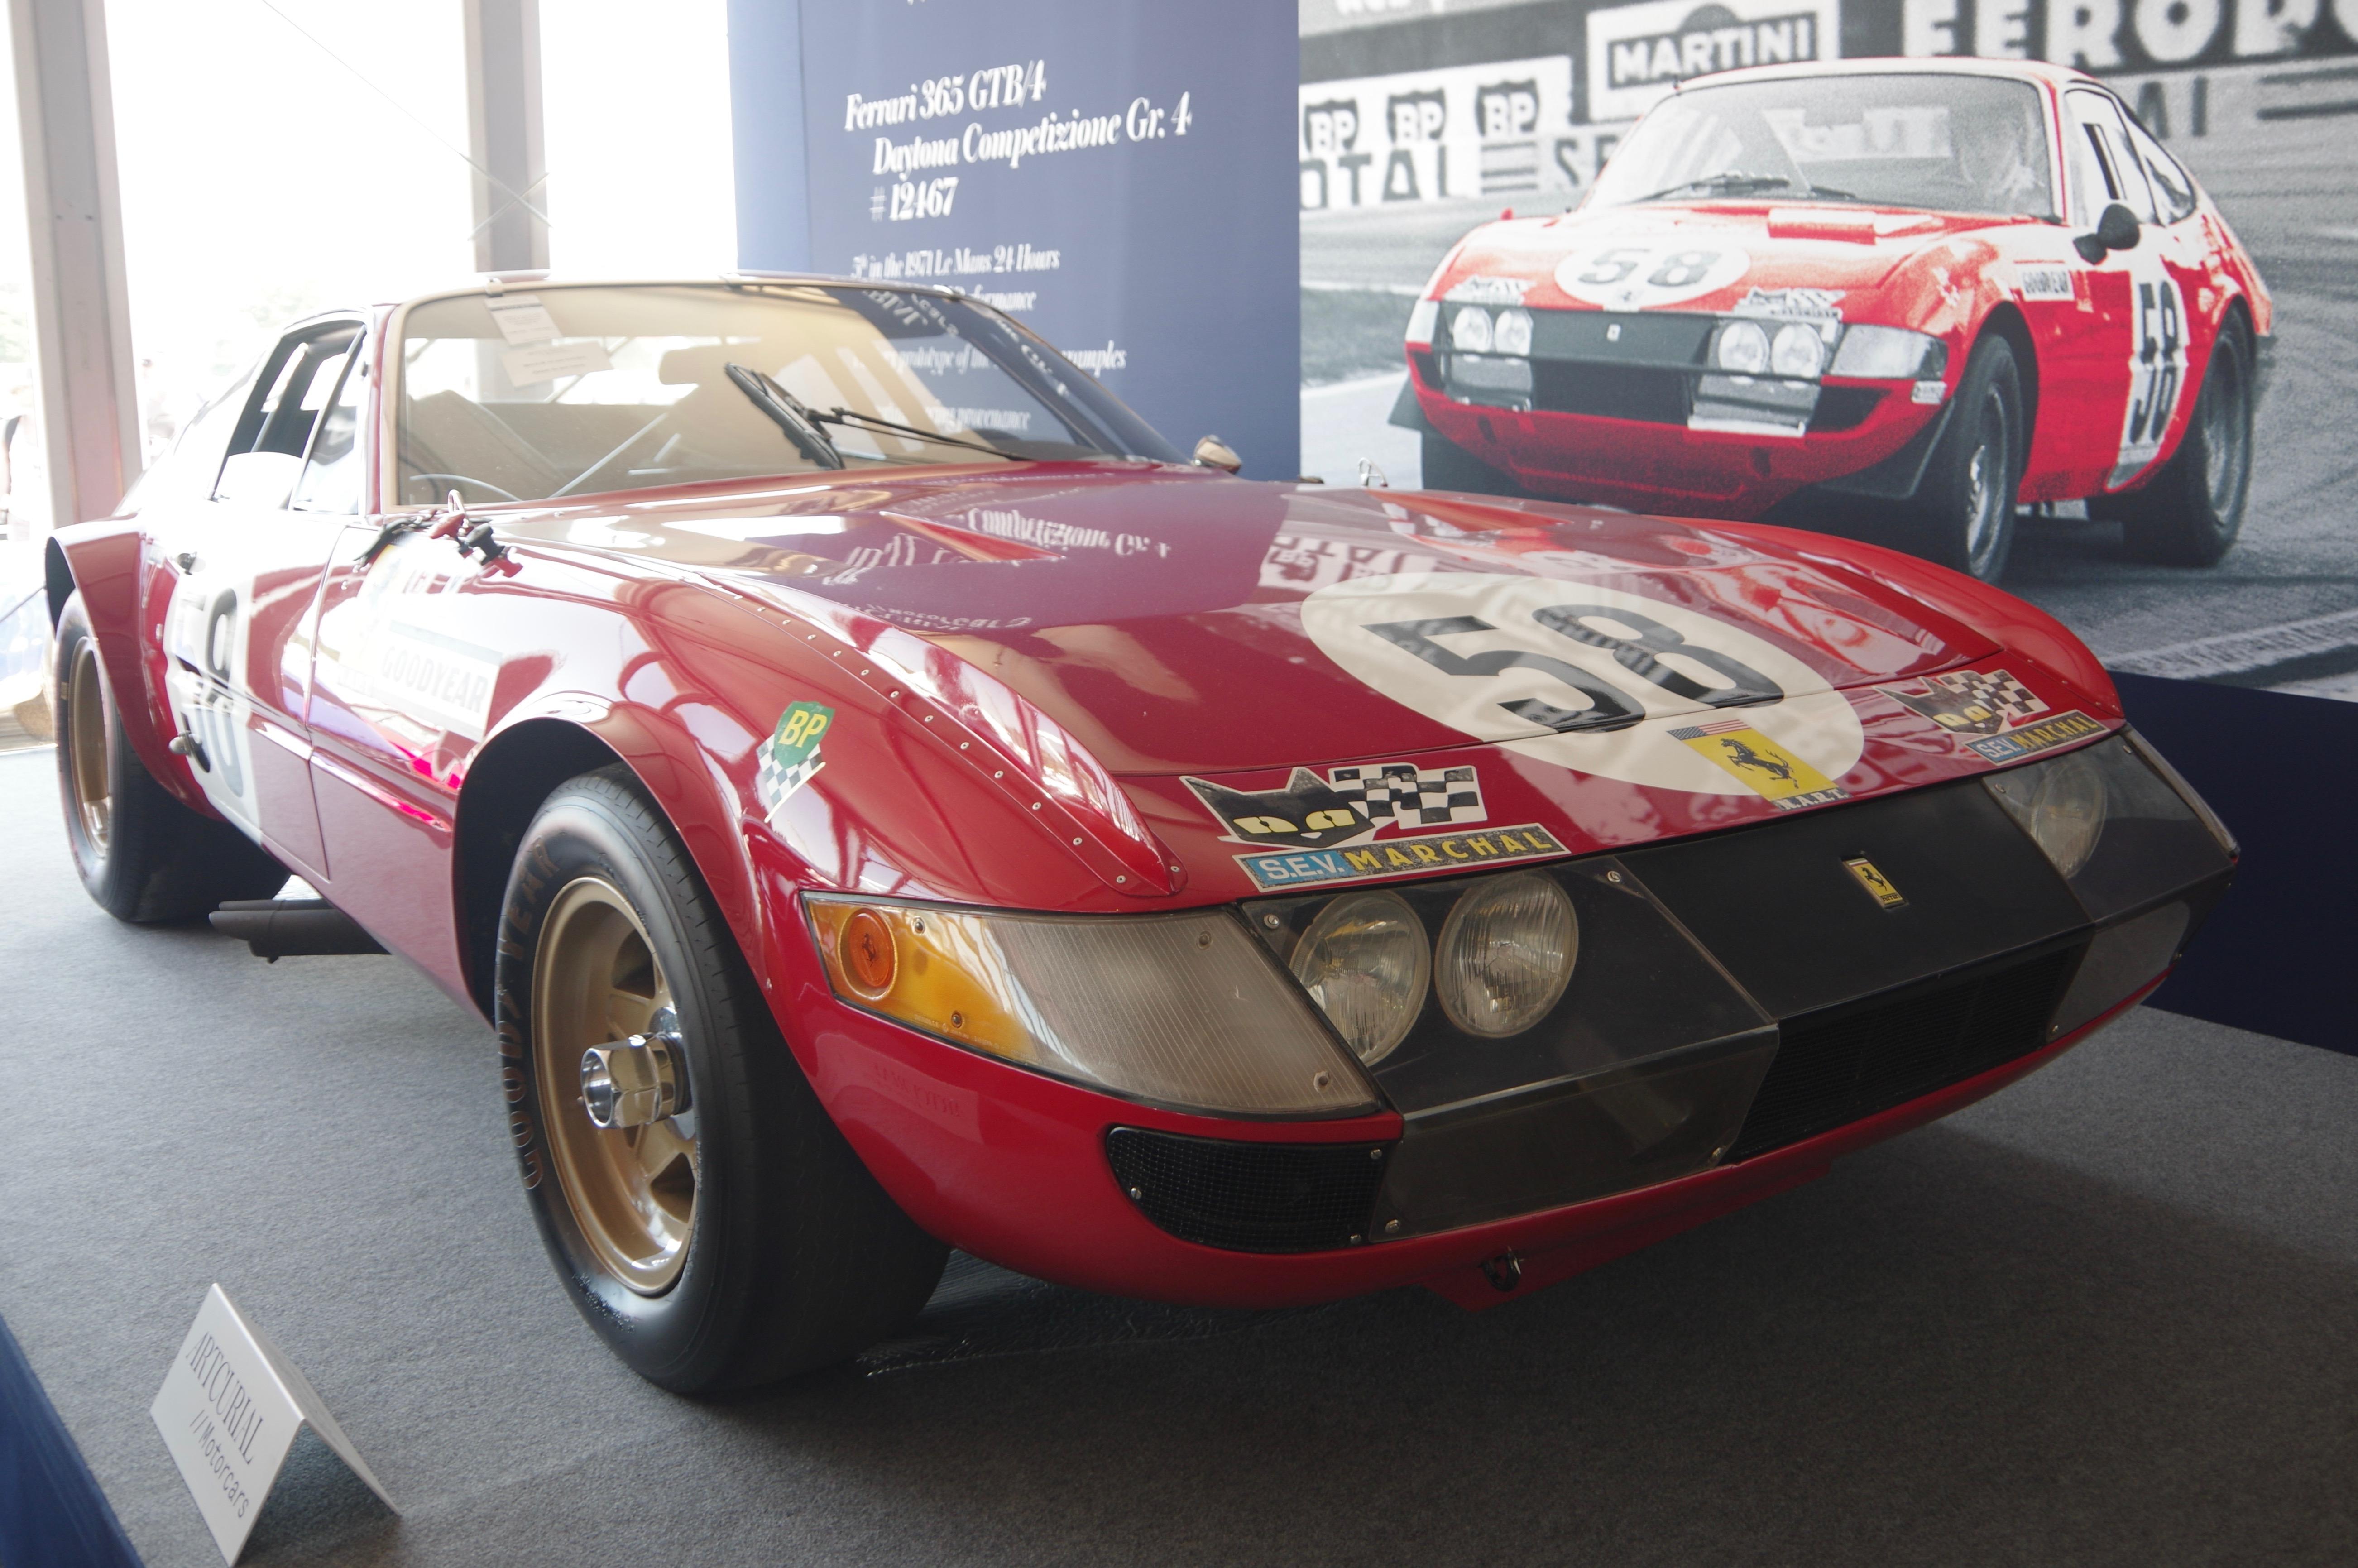 Datei 1969 Ferrari 365 Gtb 4 Daytona Competizione Group 4